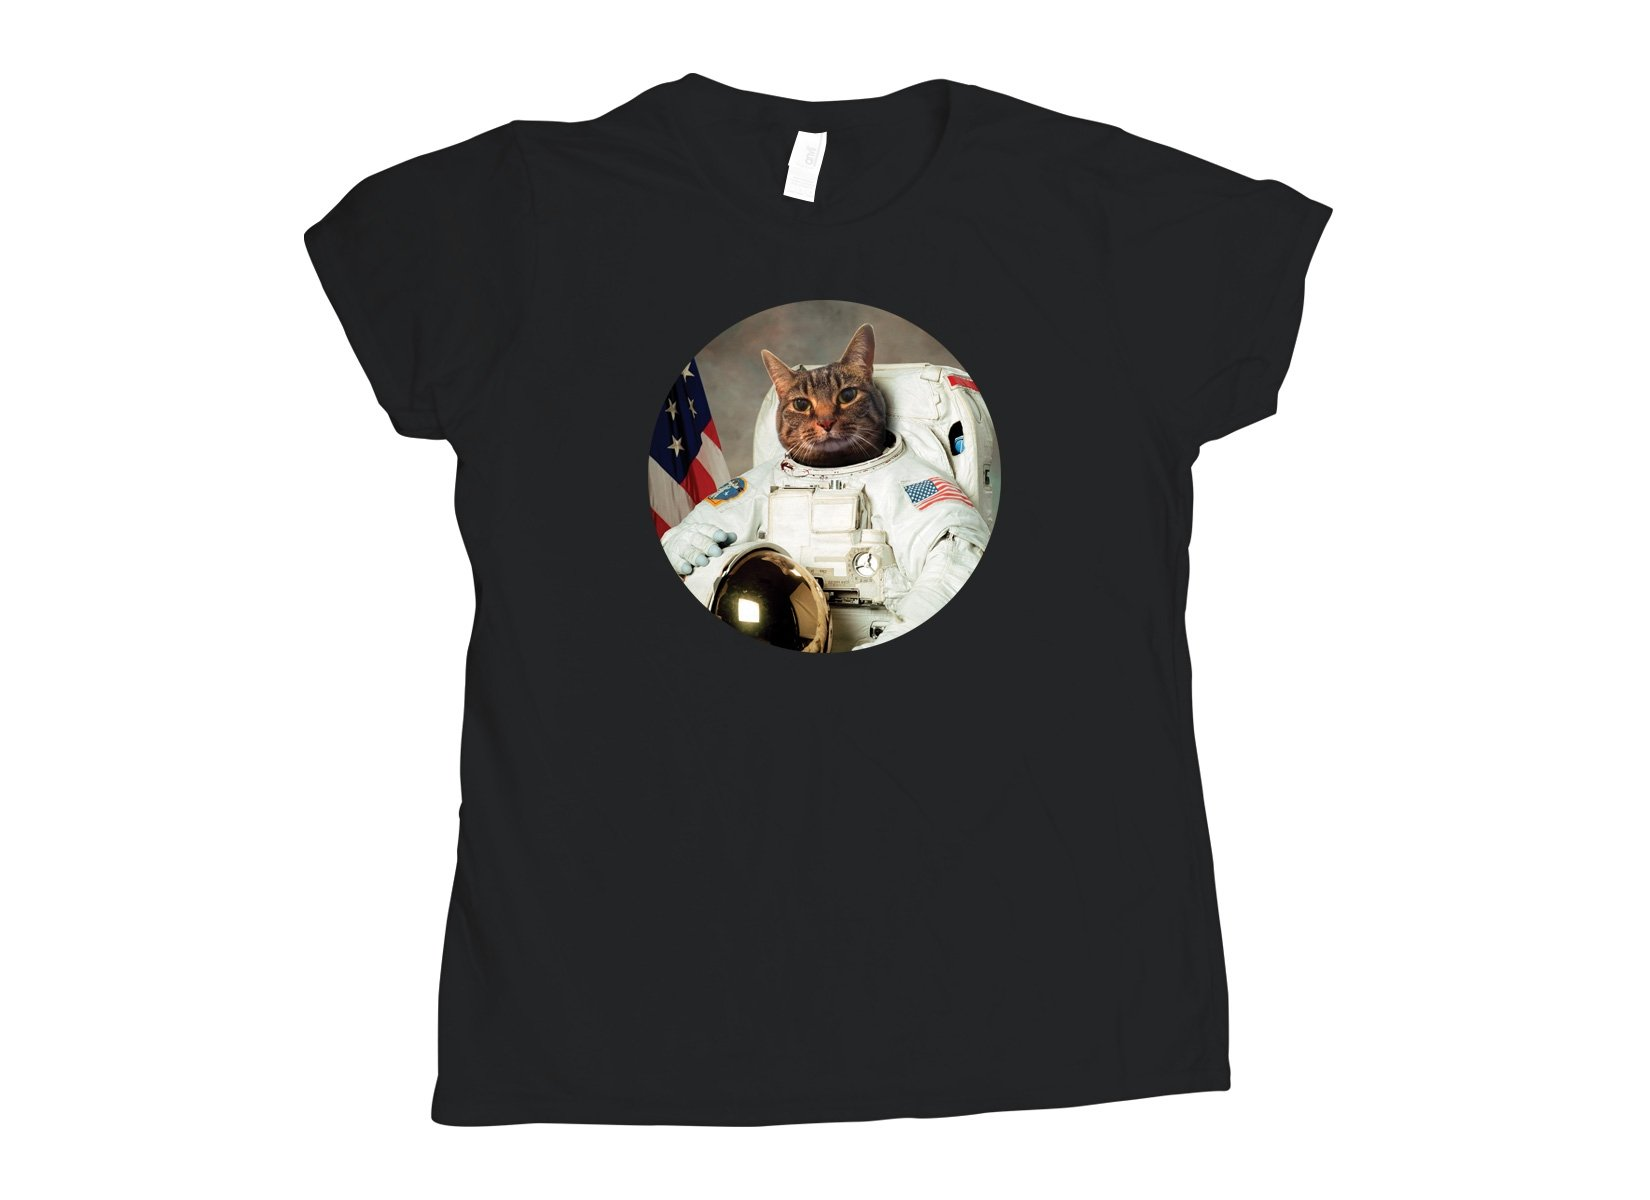 Astrocat on Womens T-Shirt